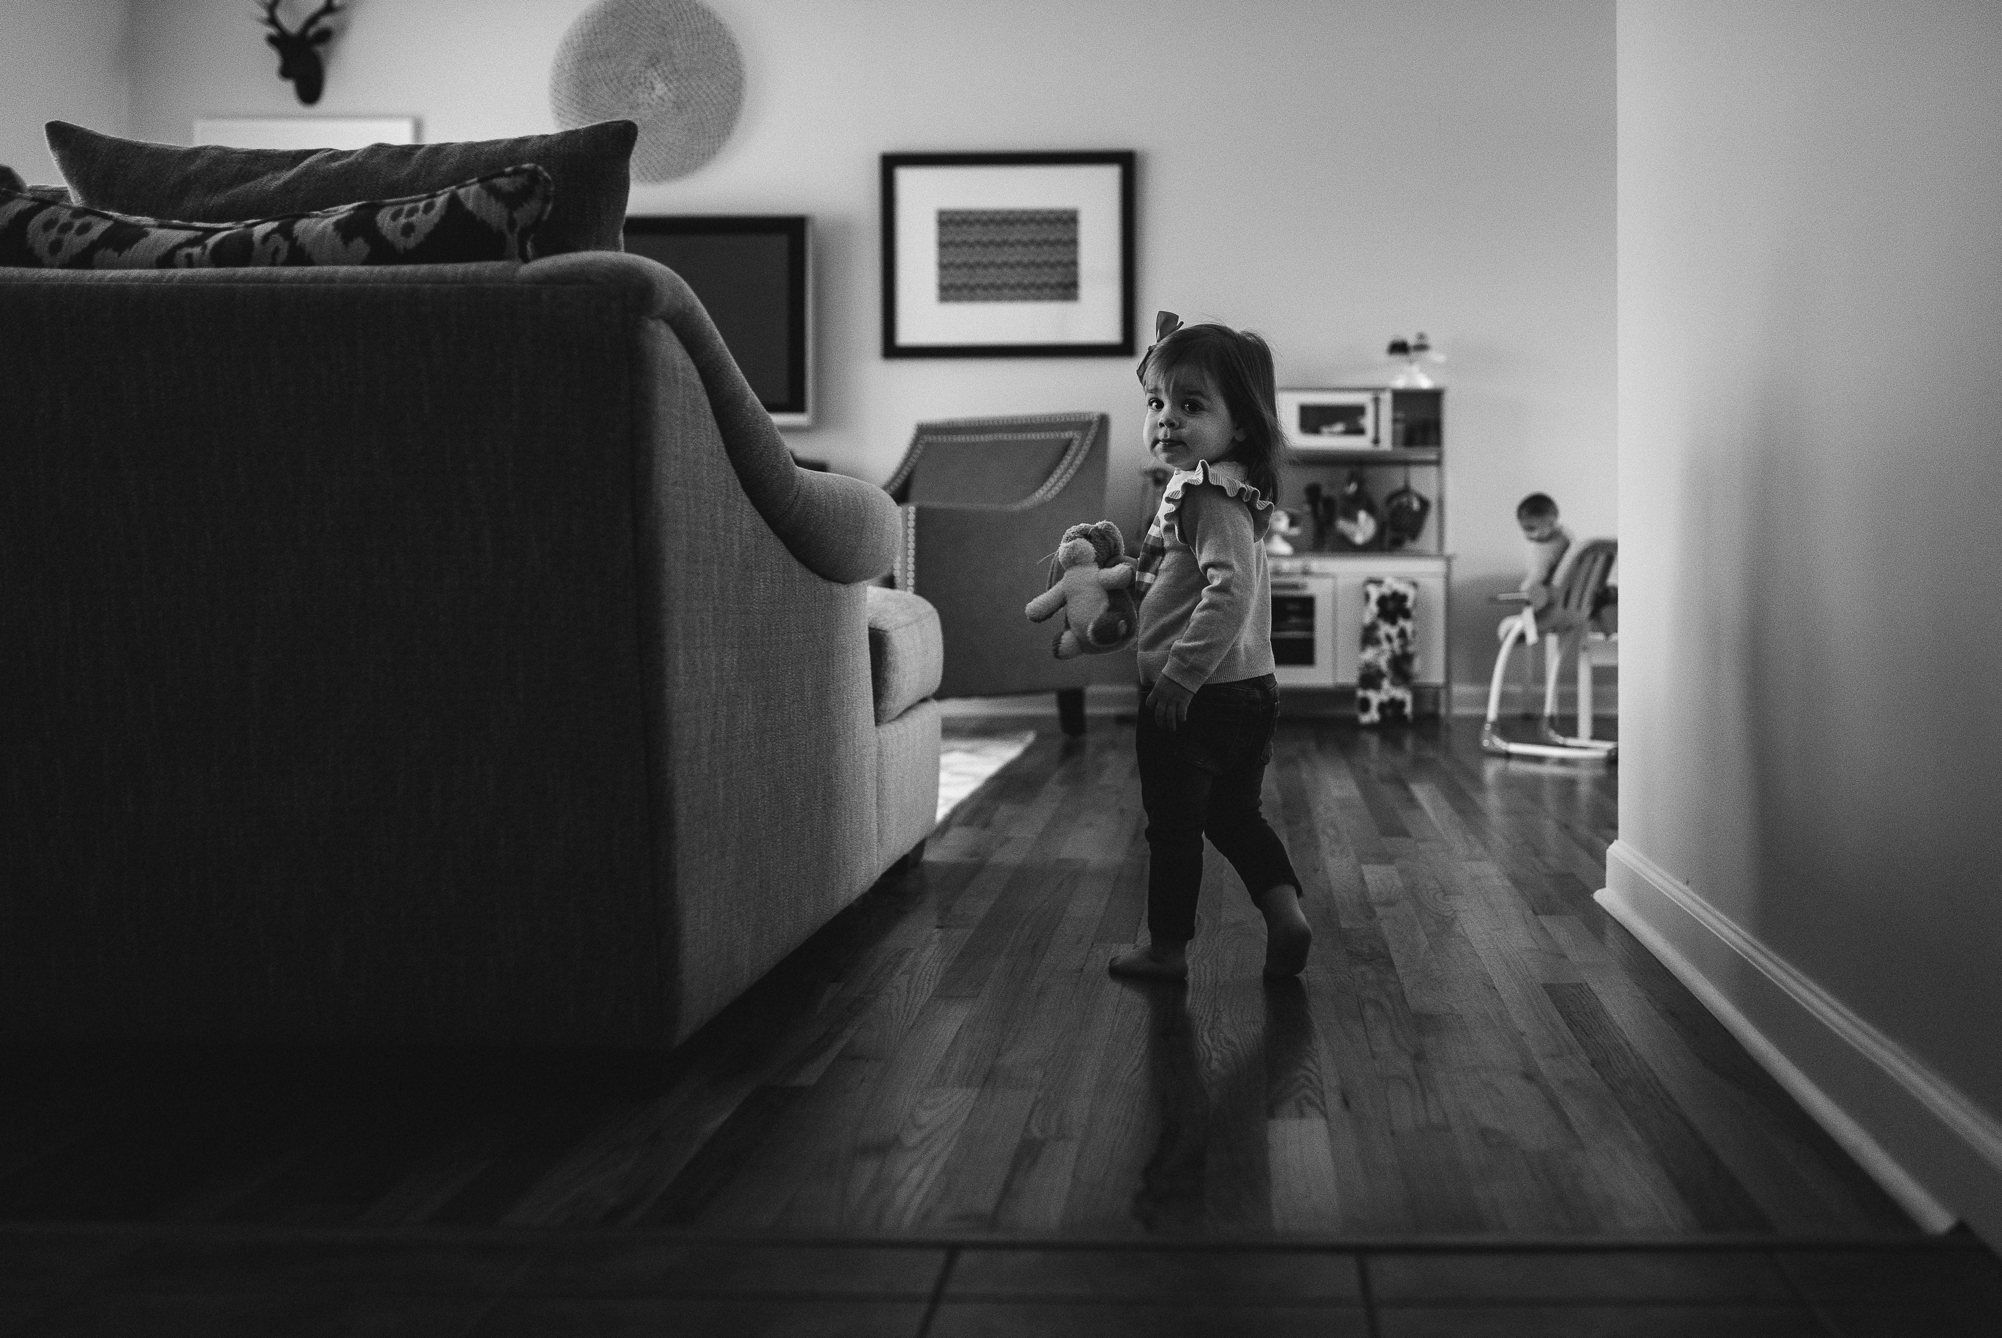 hallway running-st louis portrait photographer